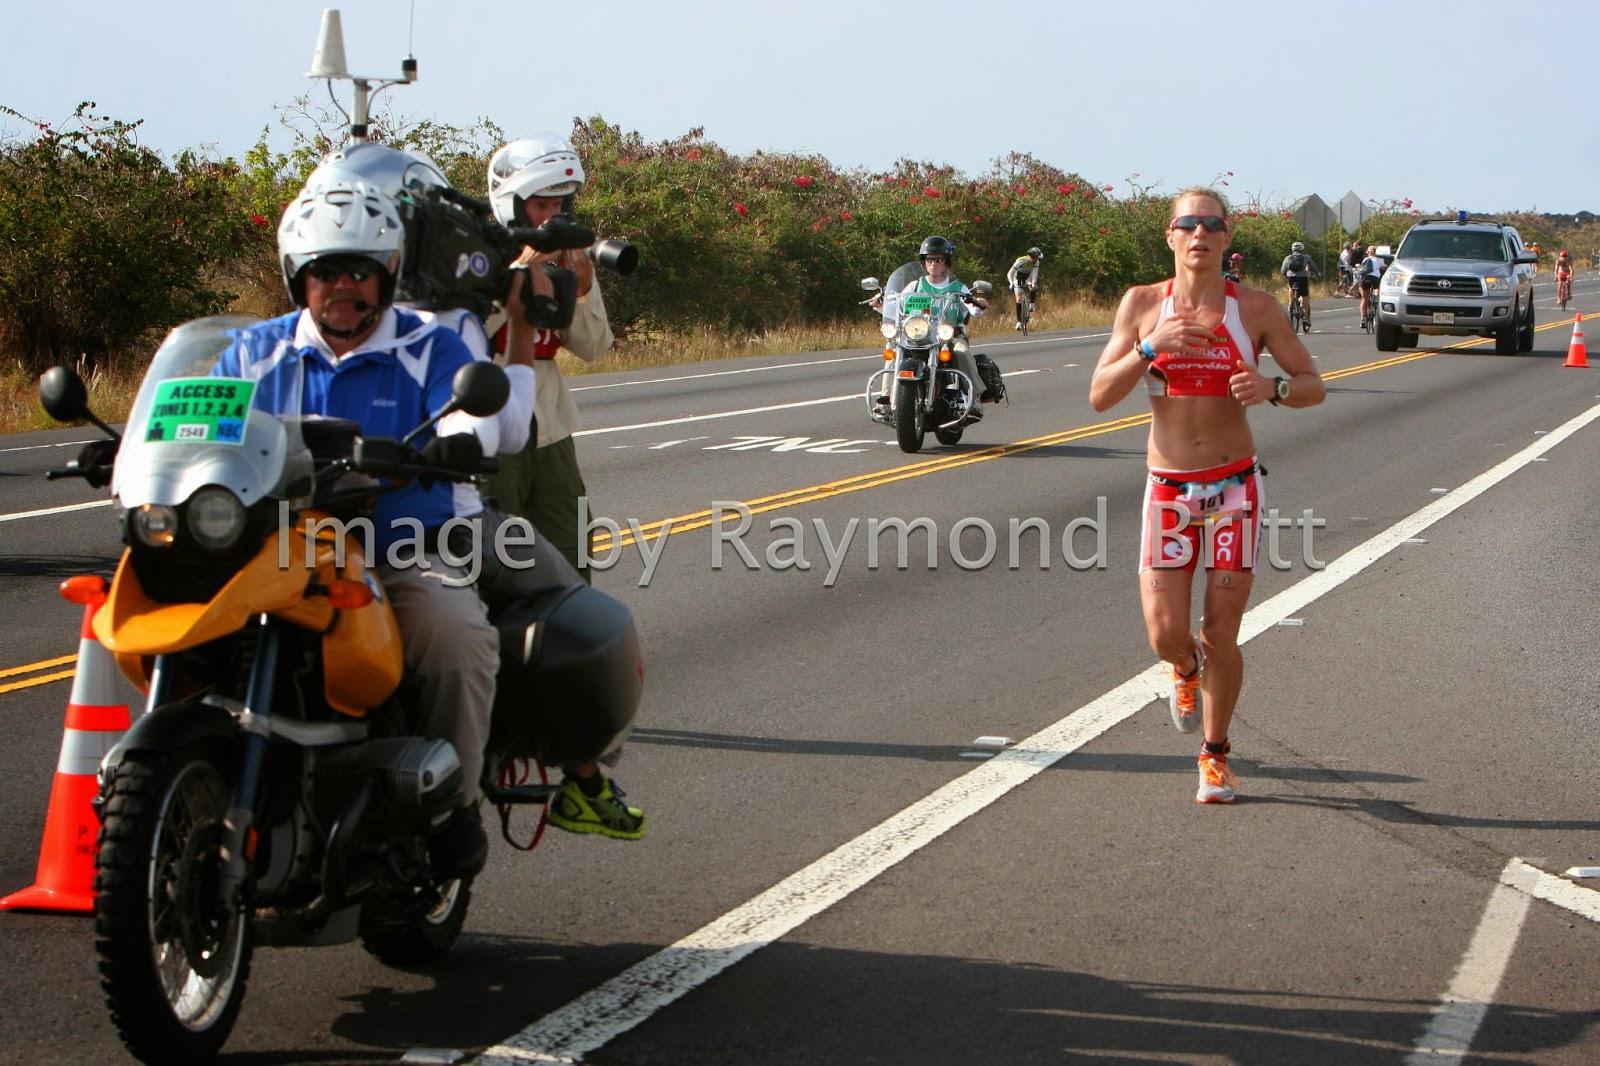 RunTri: Ironman Kona 2013 Results Analysis: Finish Times ...